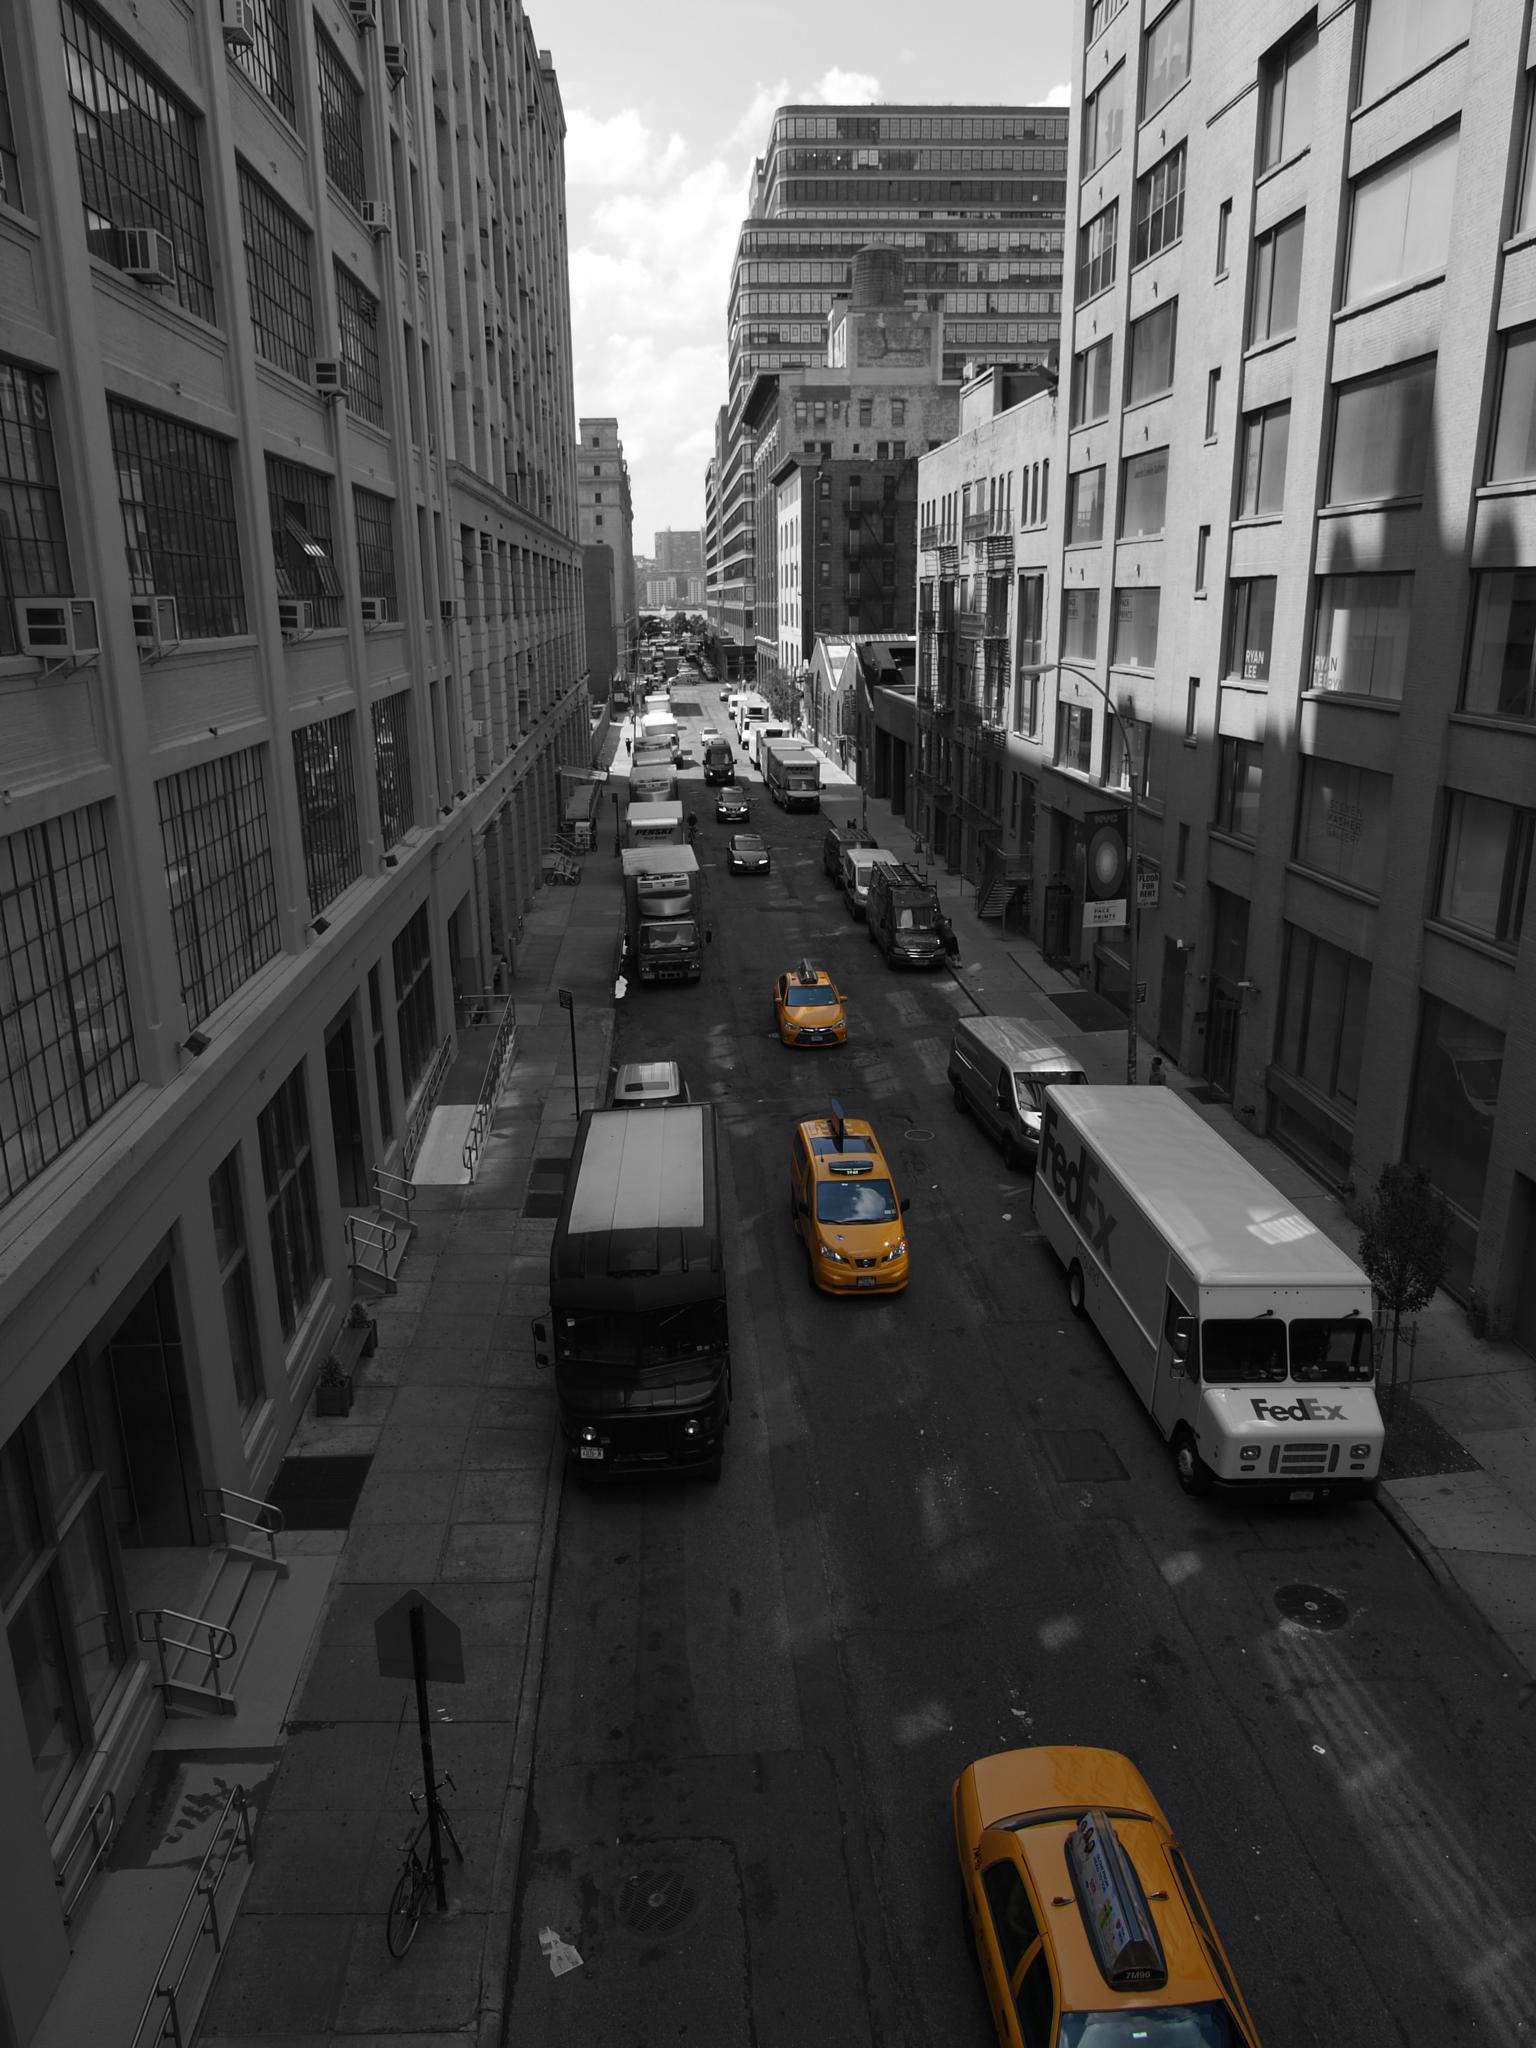 NYC by zohhyunmin